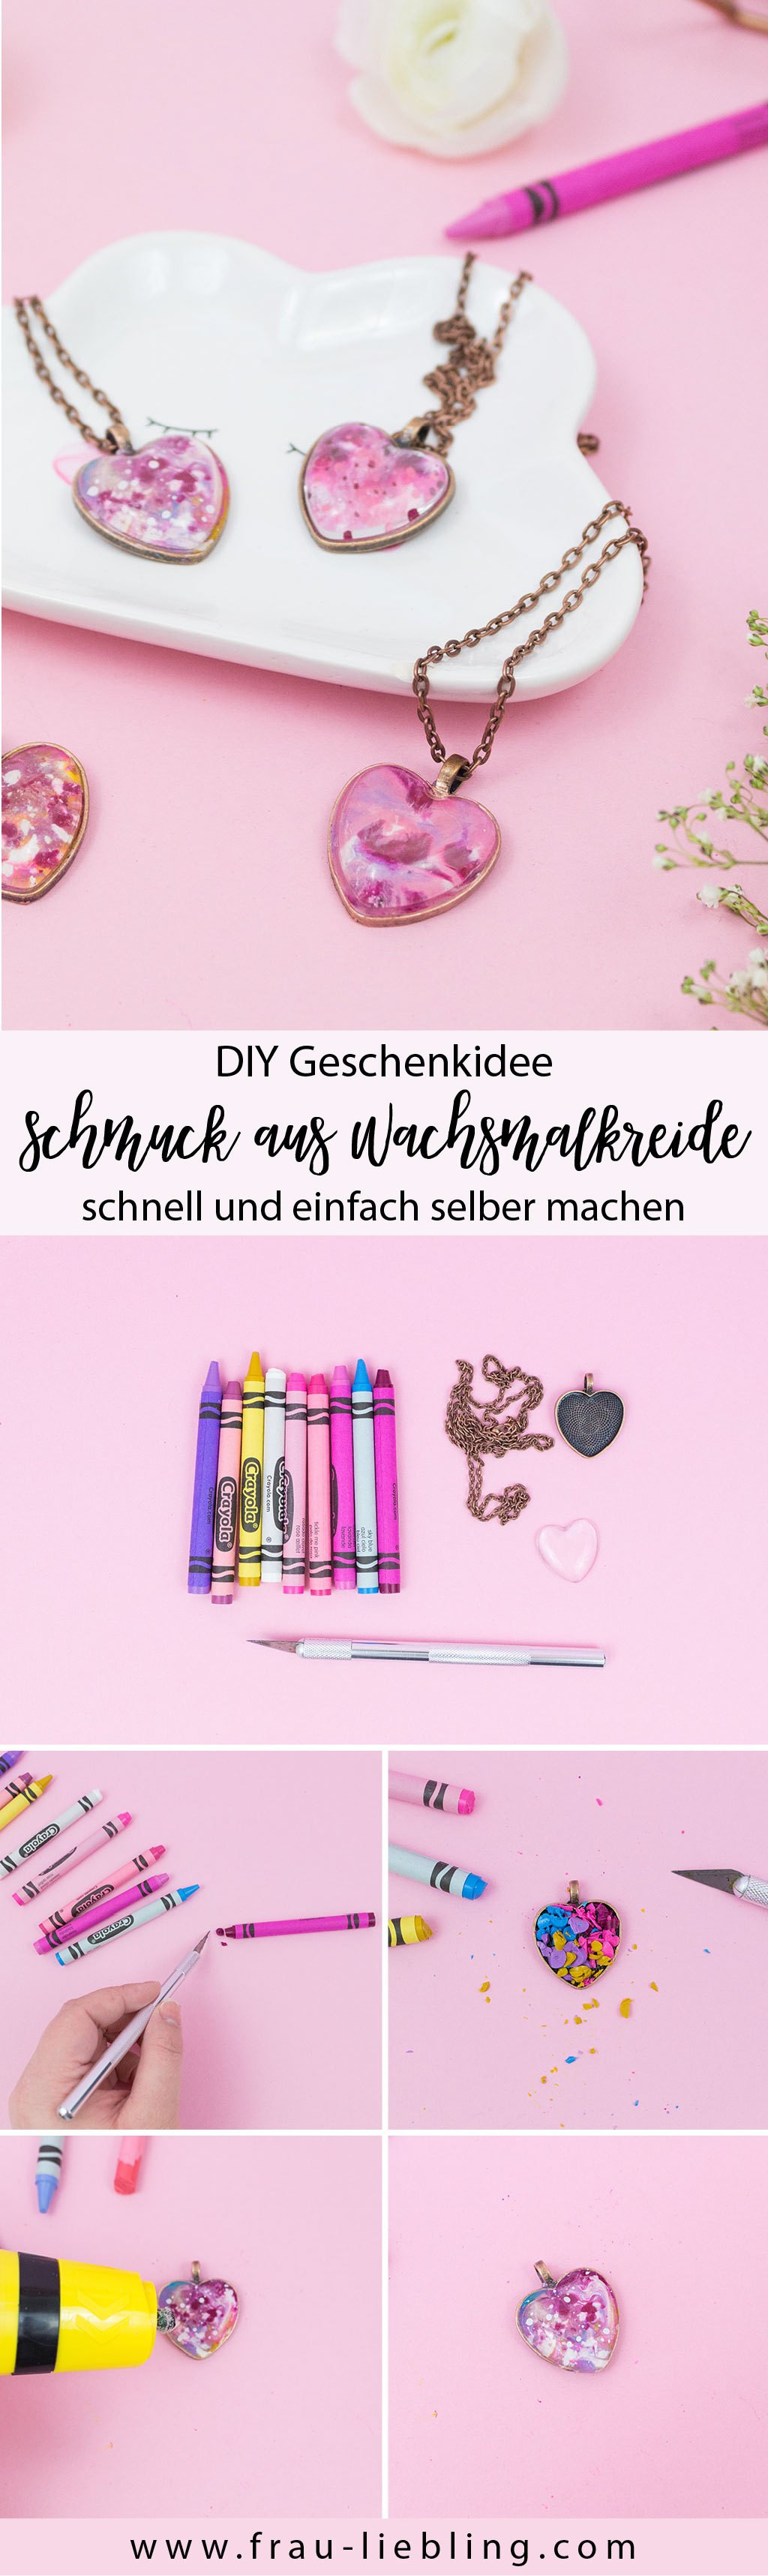 Diy Blog Schmuck  Geschenkidee DIY Schmuck aus Wachsmalkreide selber machen